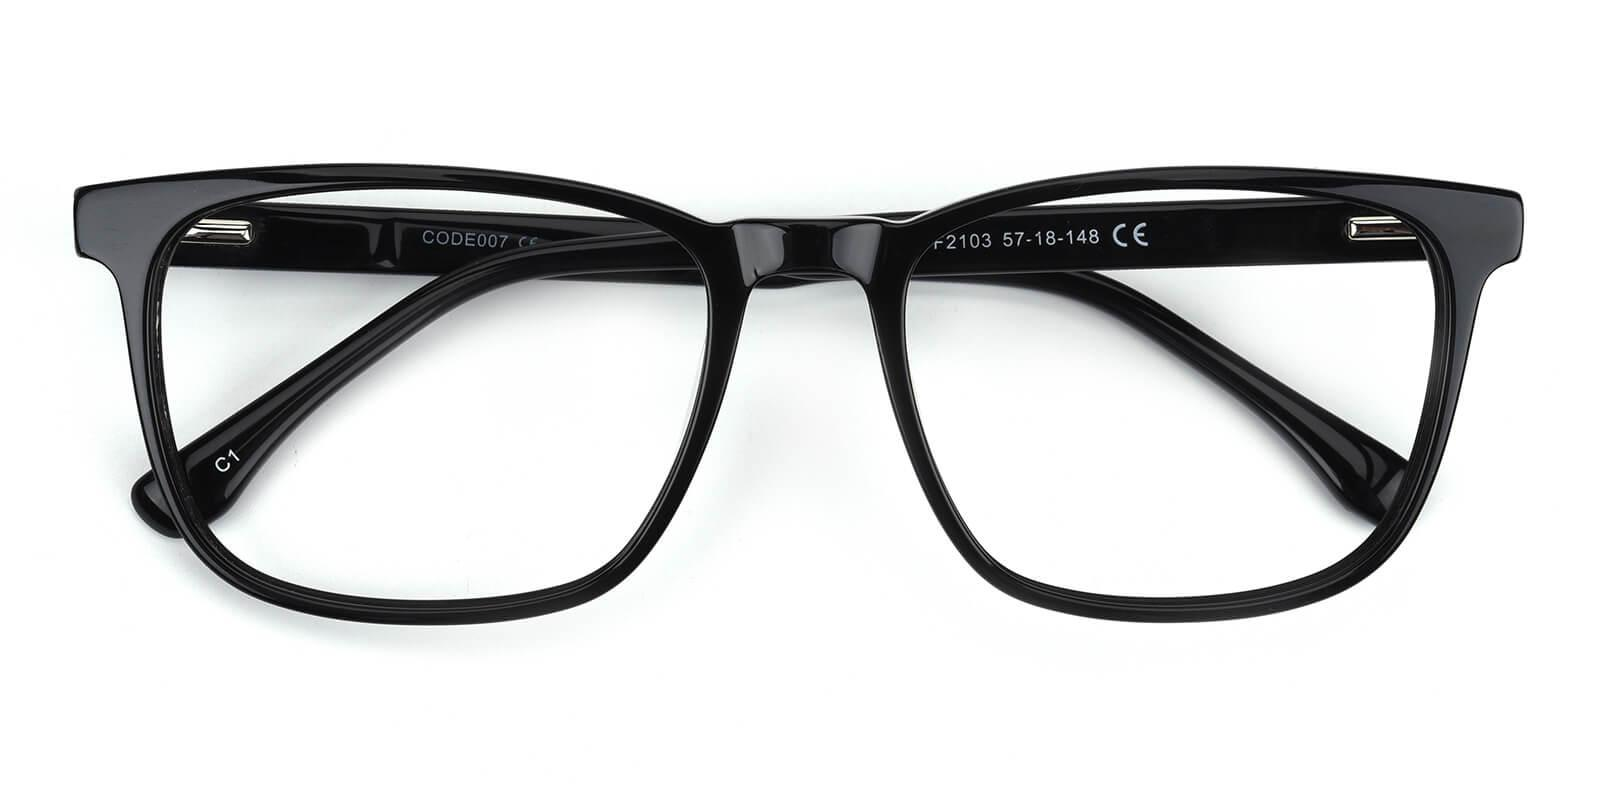 Tages-Black-Square-Acetate-Eyeglasses-detail